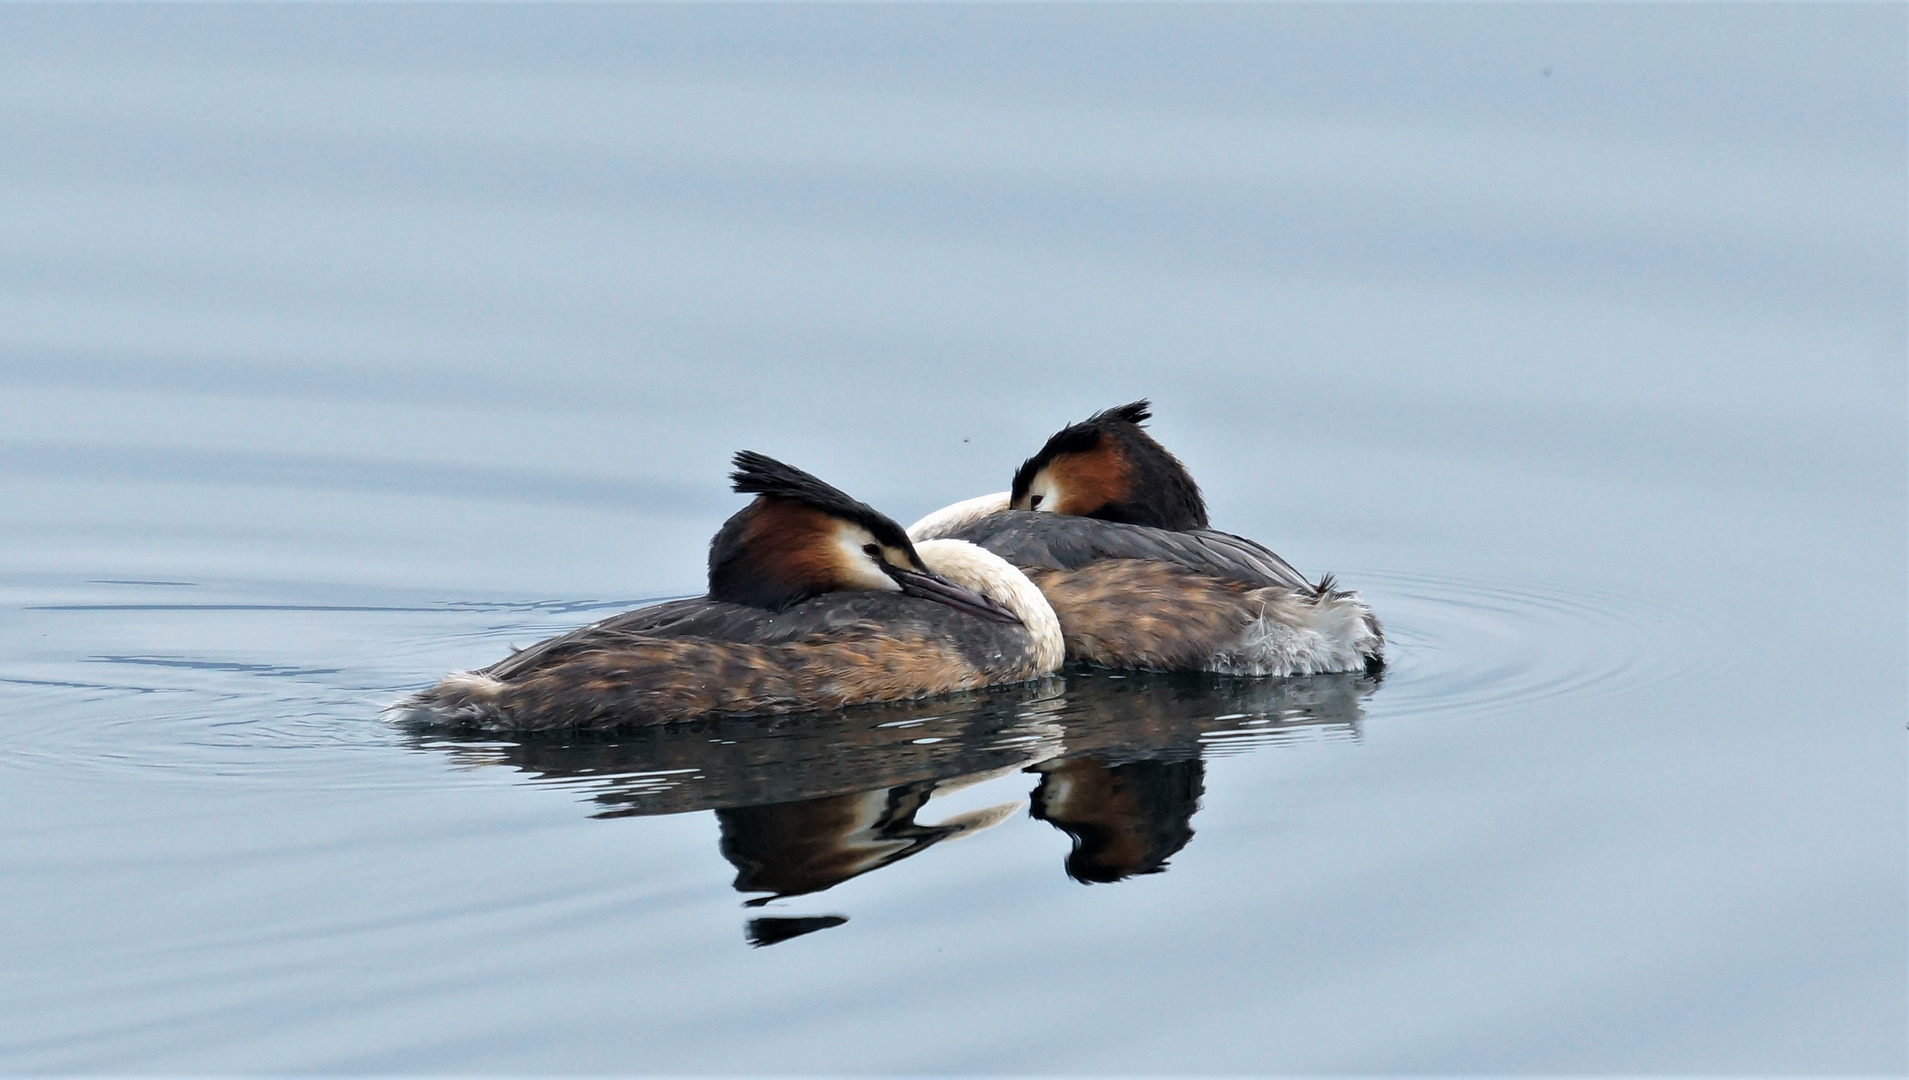 Haubentaucherpaar bei Sipplingen am Bodensee